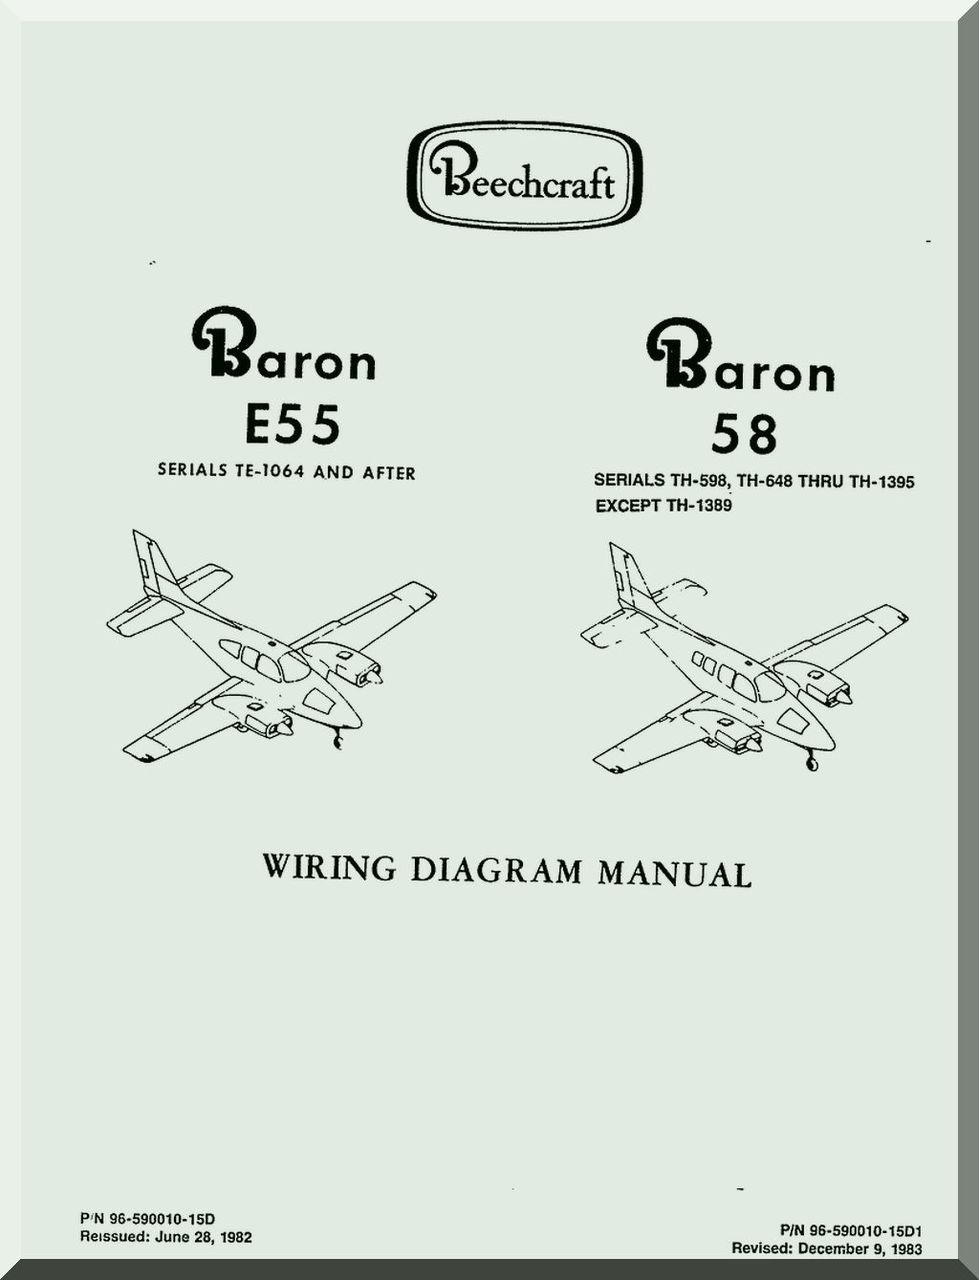 medium resolution of wiring diagram manual aircraft beechcraft baron e 55 58 aircraft wiring diagram manual